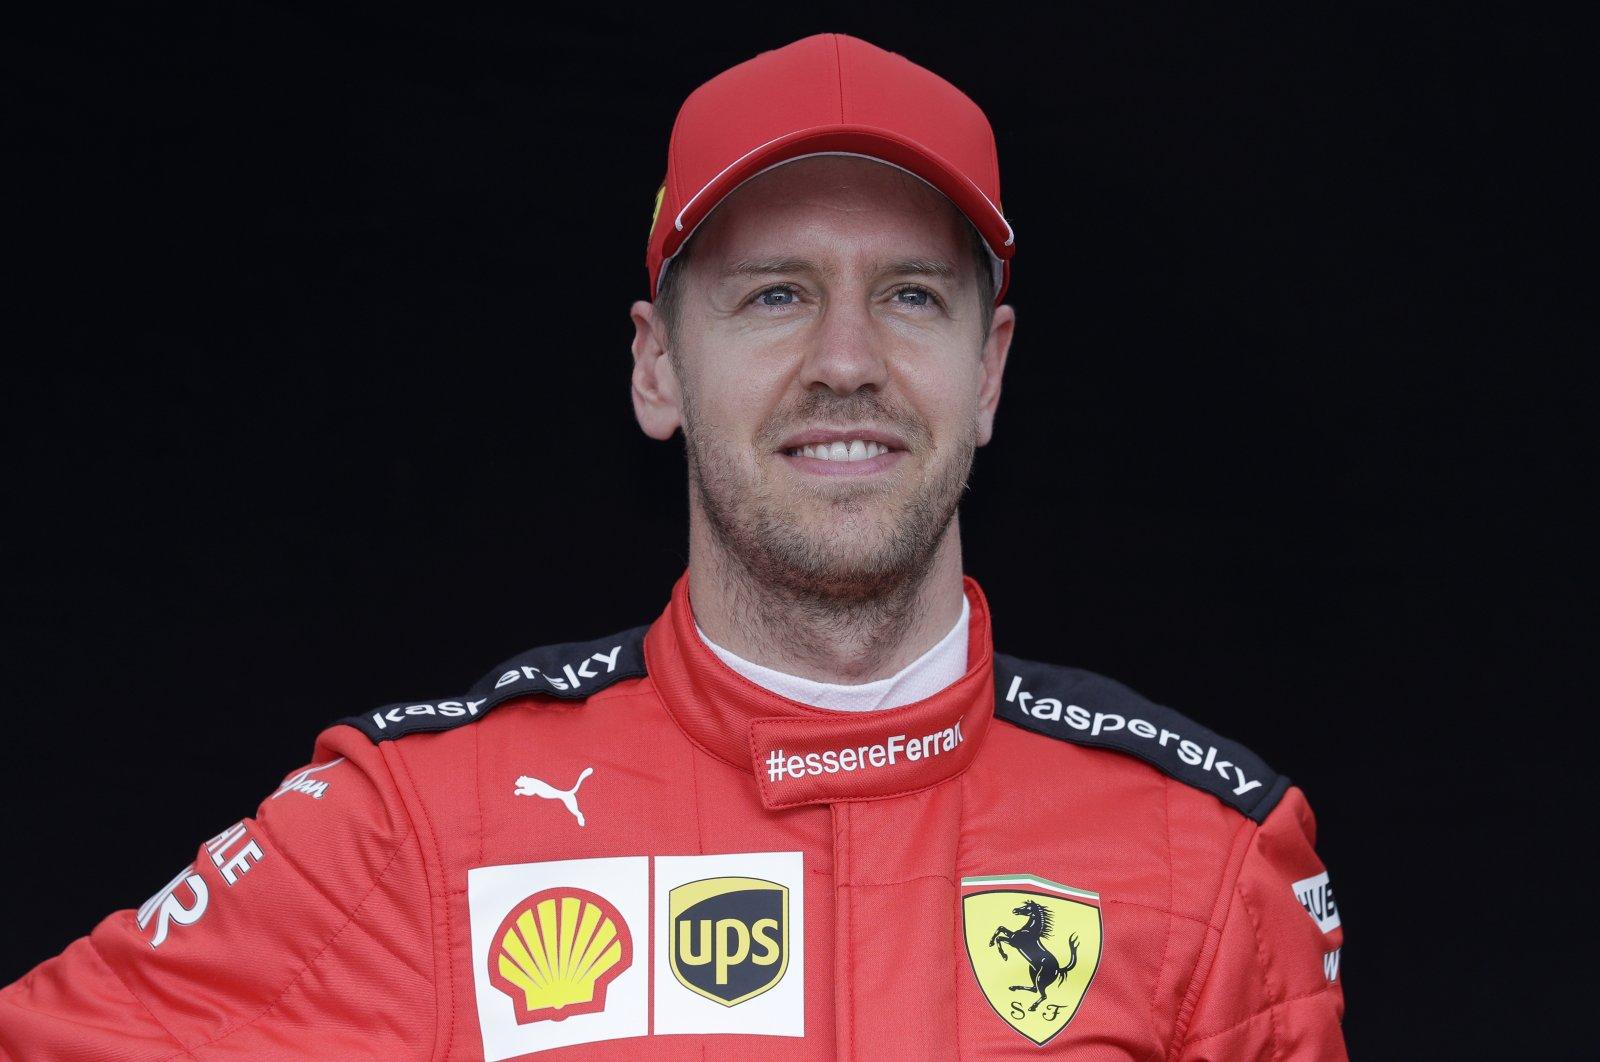 Ferrari's Sebastian Vettel poses for a photo at the Australian Grand Prix in Melbourne, March 12, 2020. (AP Photo)